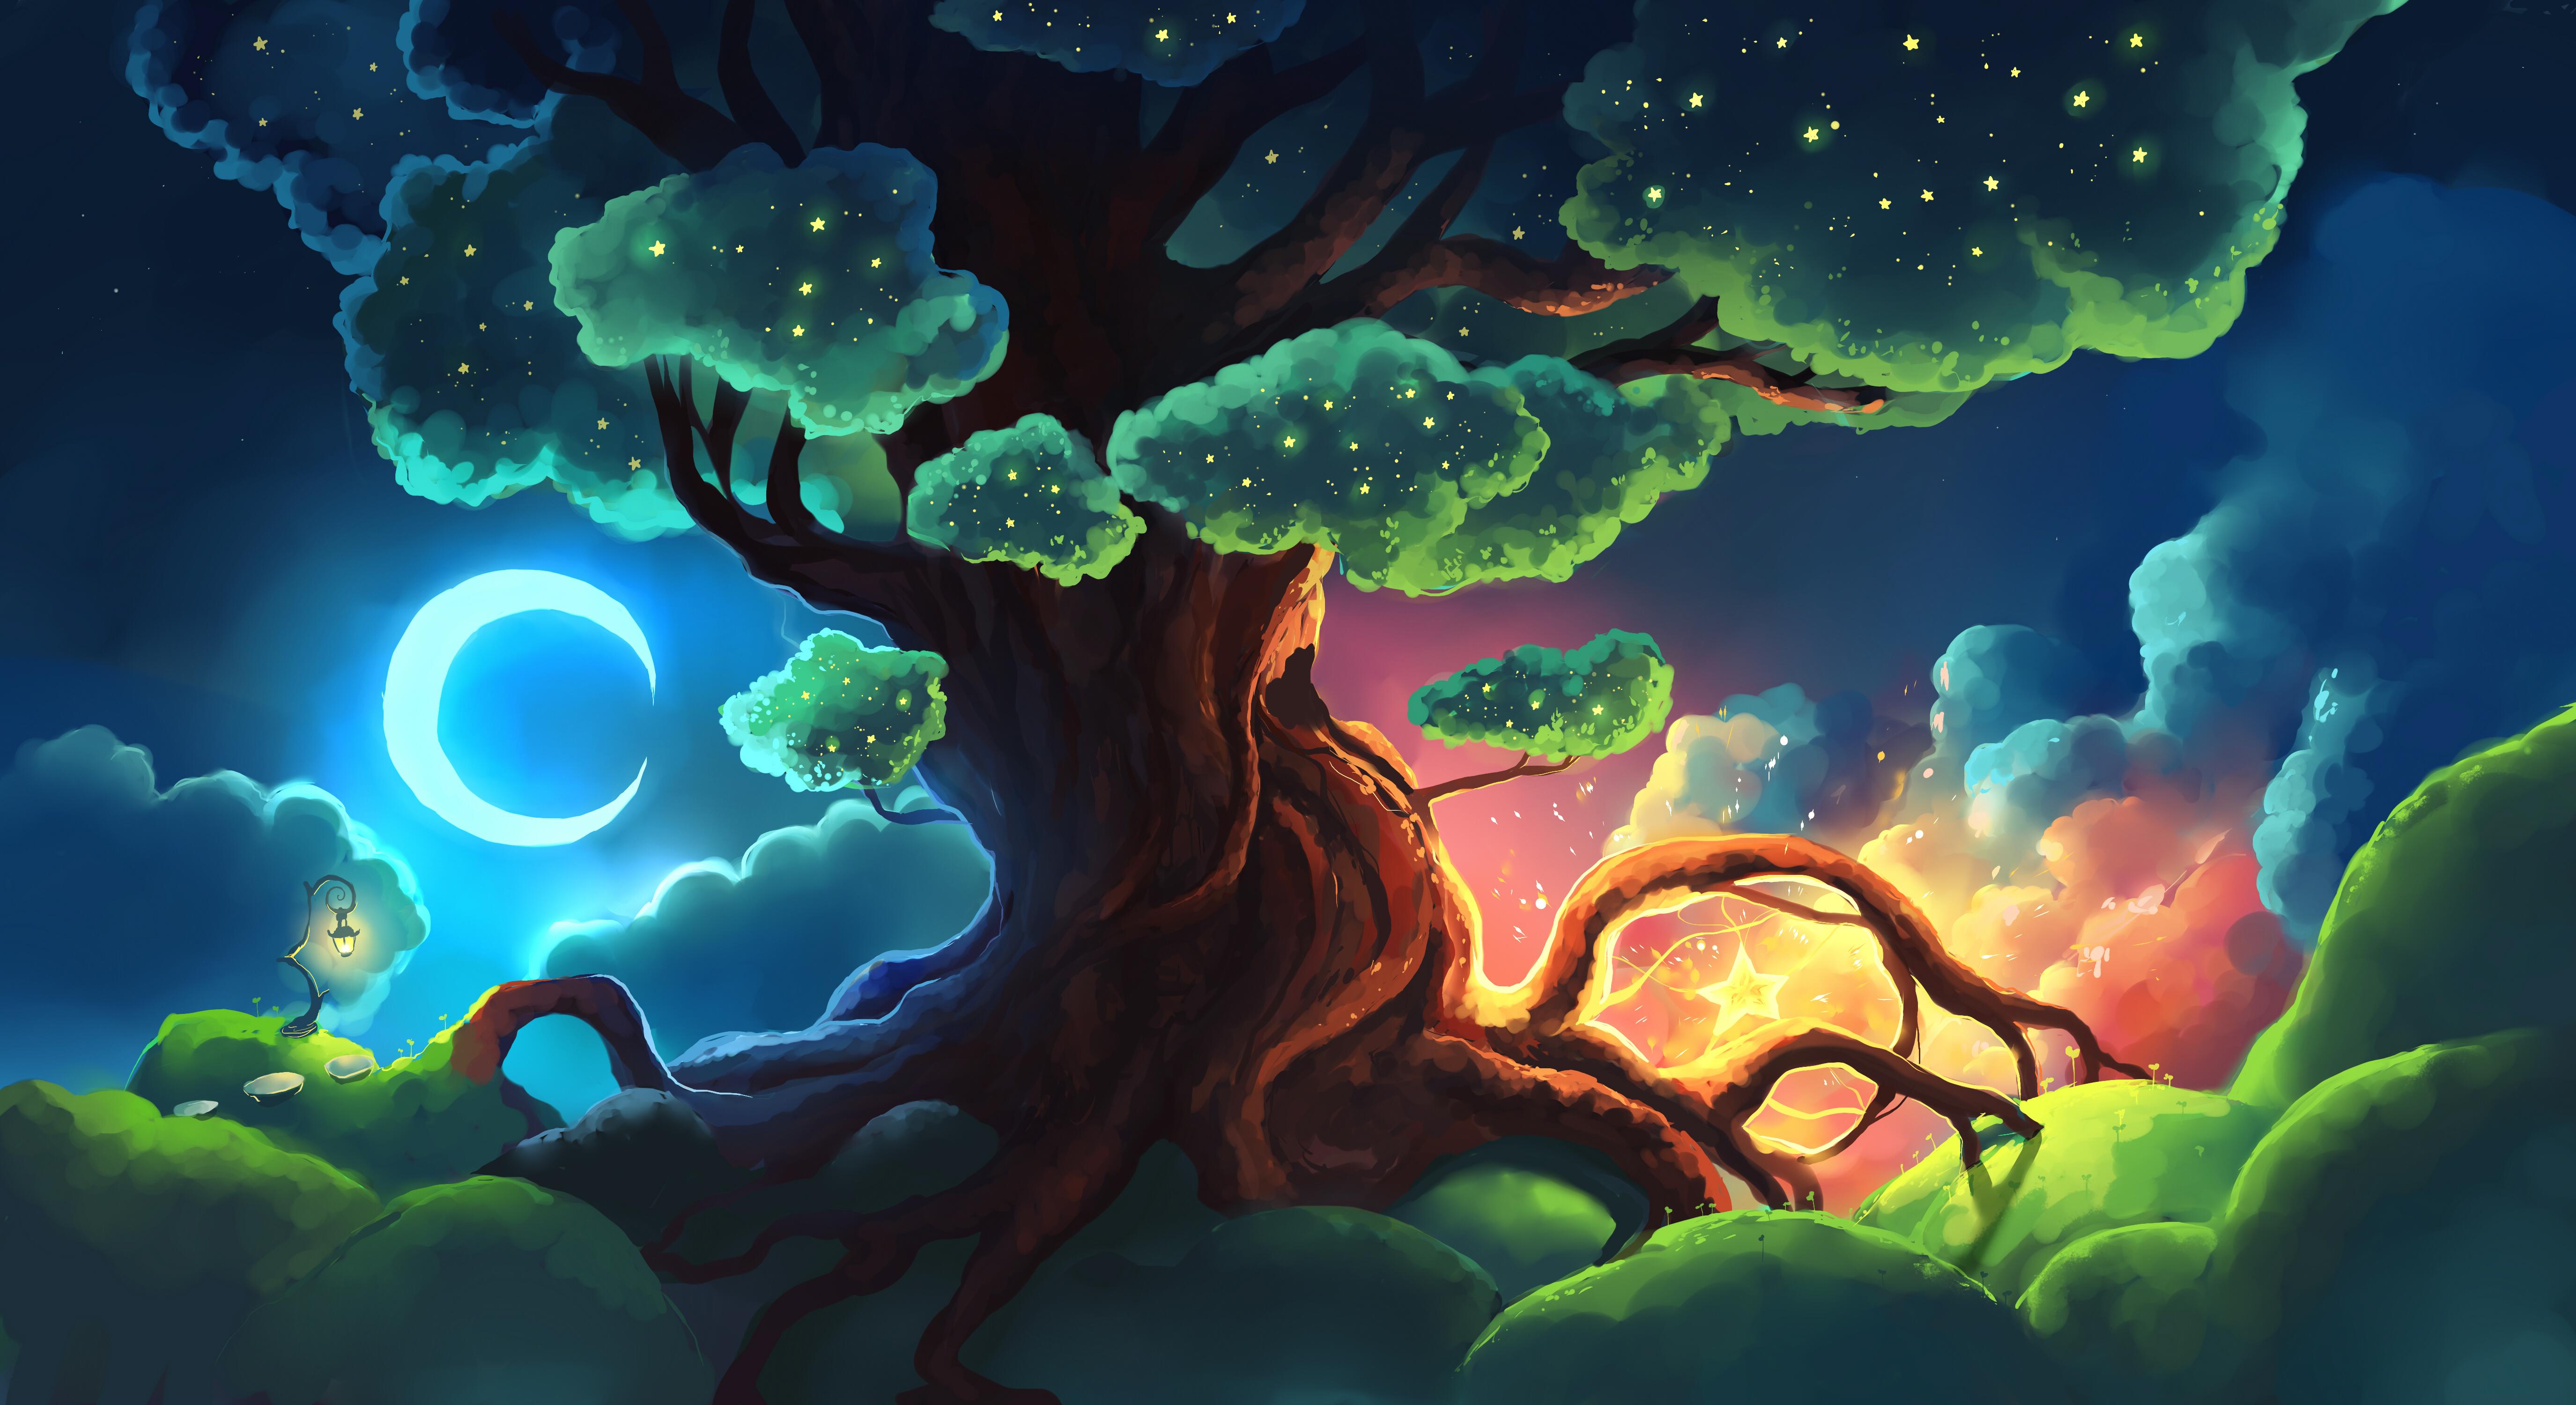 General 5500x3000 digital art artwork fantasy art digital painting trees nature lights clouds crescent moon Moon moon rays roots lamp landscape magic leaves shining shiny plants lantern Chibionpu